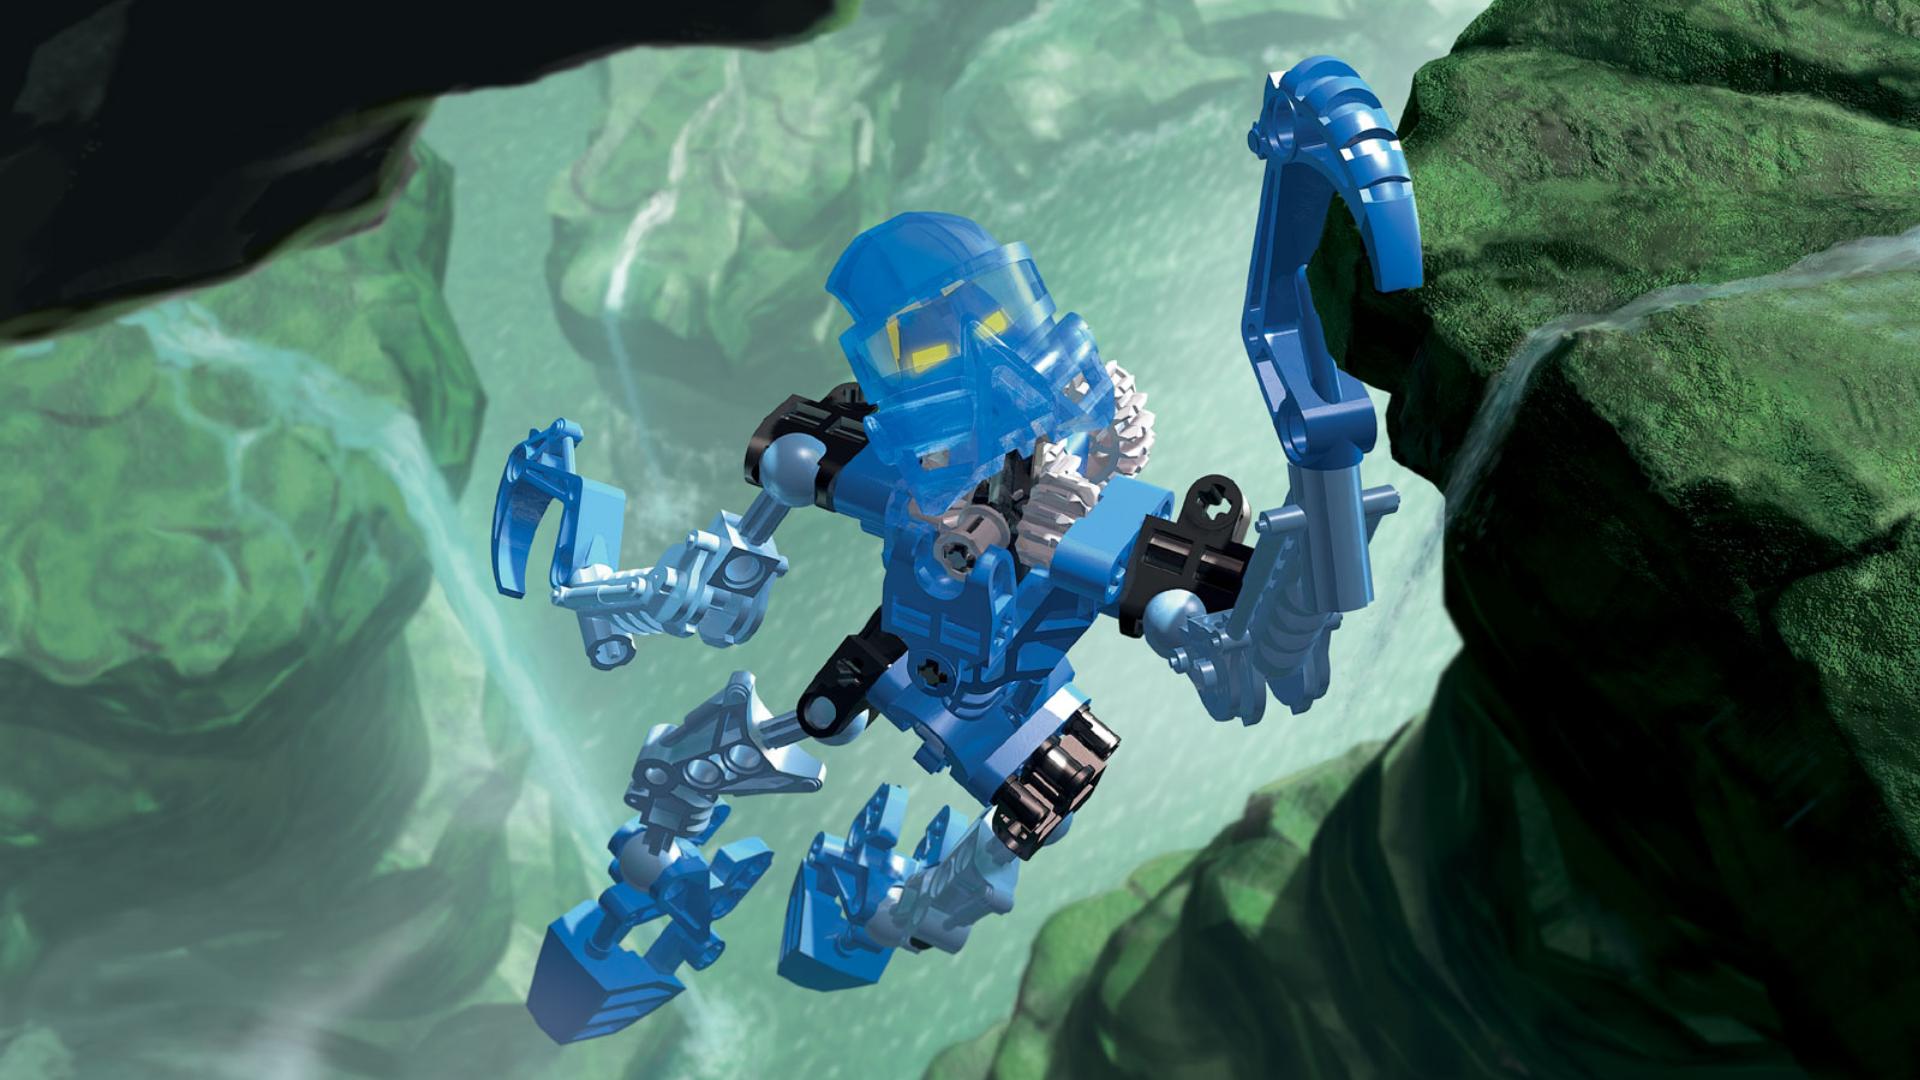 Products Lego Bionicle Lego Toa Mata Hd Wallpaper Background Image Lego Wallpaper Bionicle Background Images